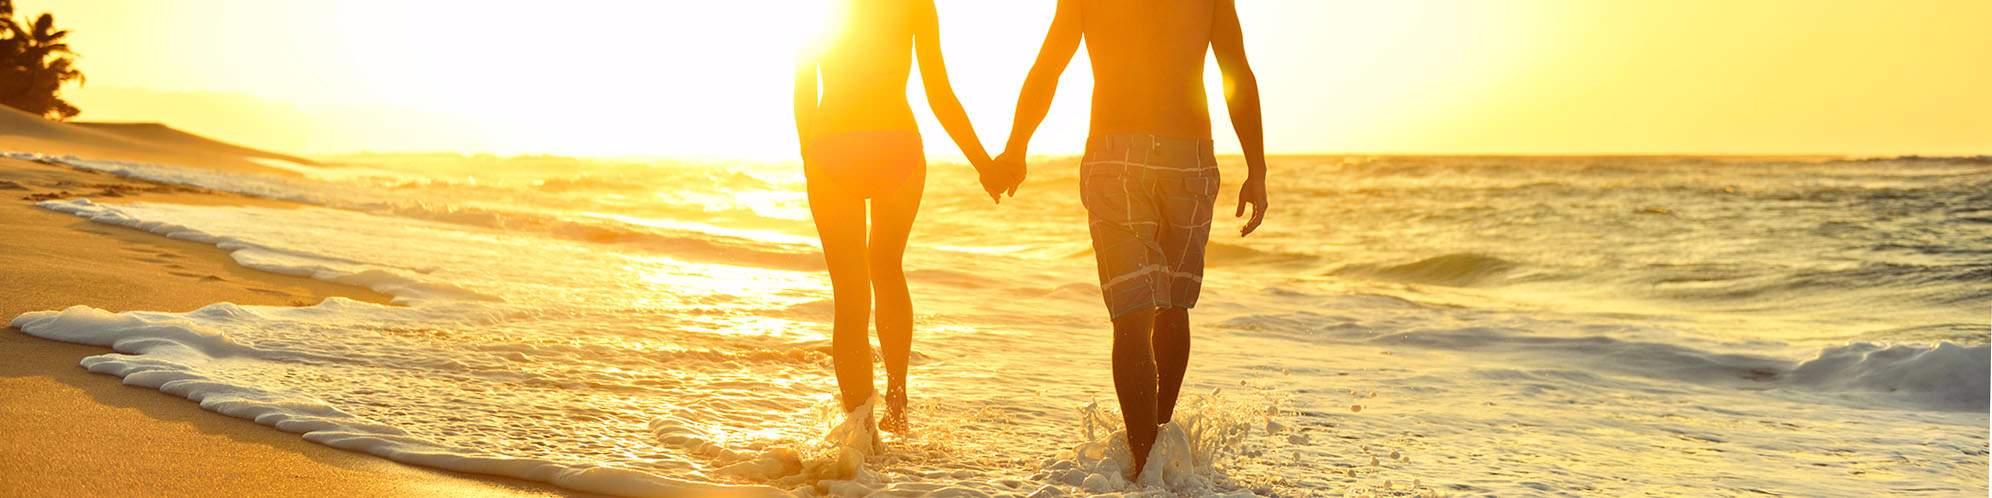 Paar, Flitterwochen, Strand, Sri Lanka